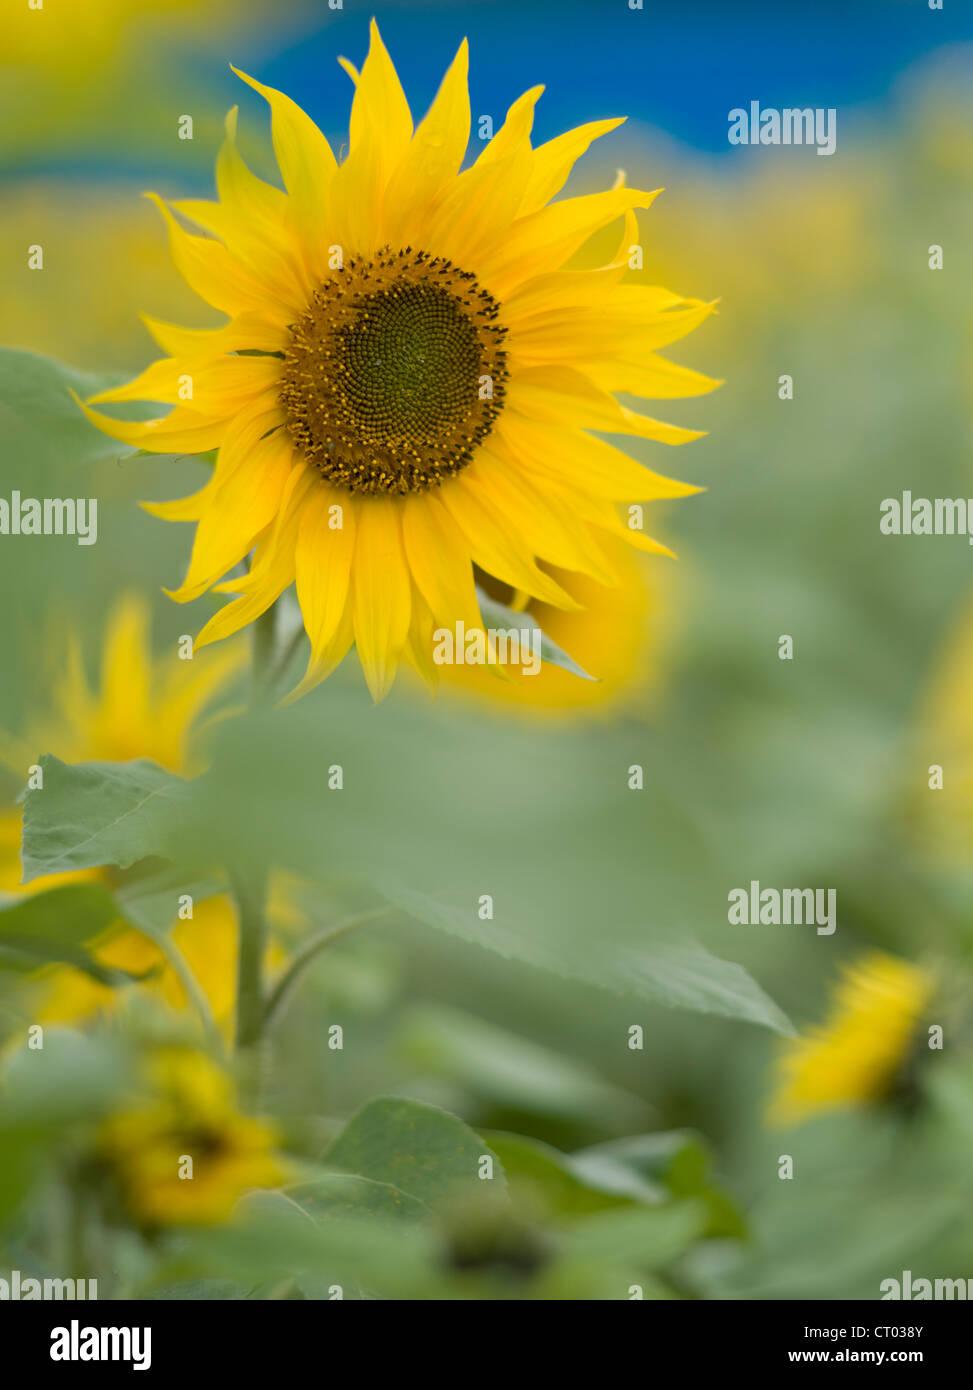 Sunflower festival, Okinawa, Japan - Stock Image